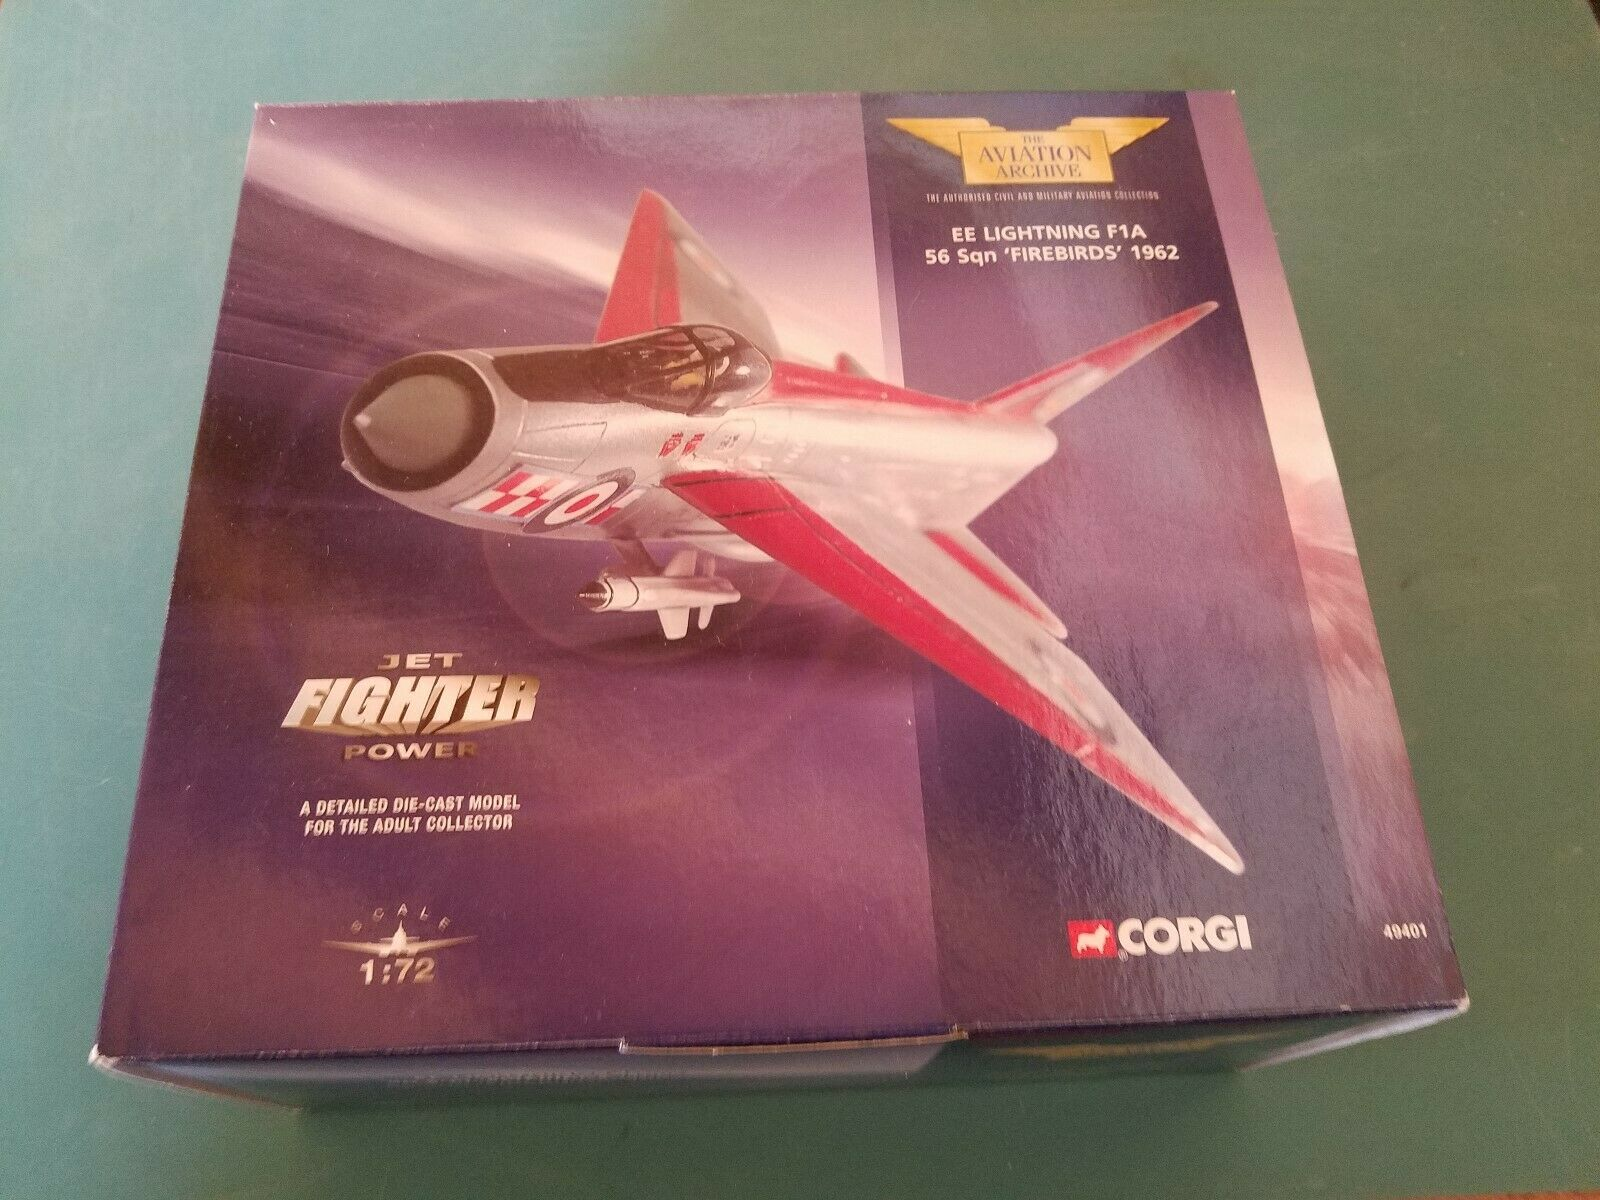 Corgi 49401 EE Lightning F1A 56 Sqn Firebirds 1962